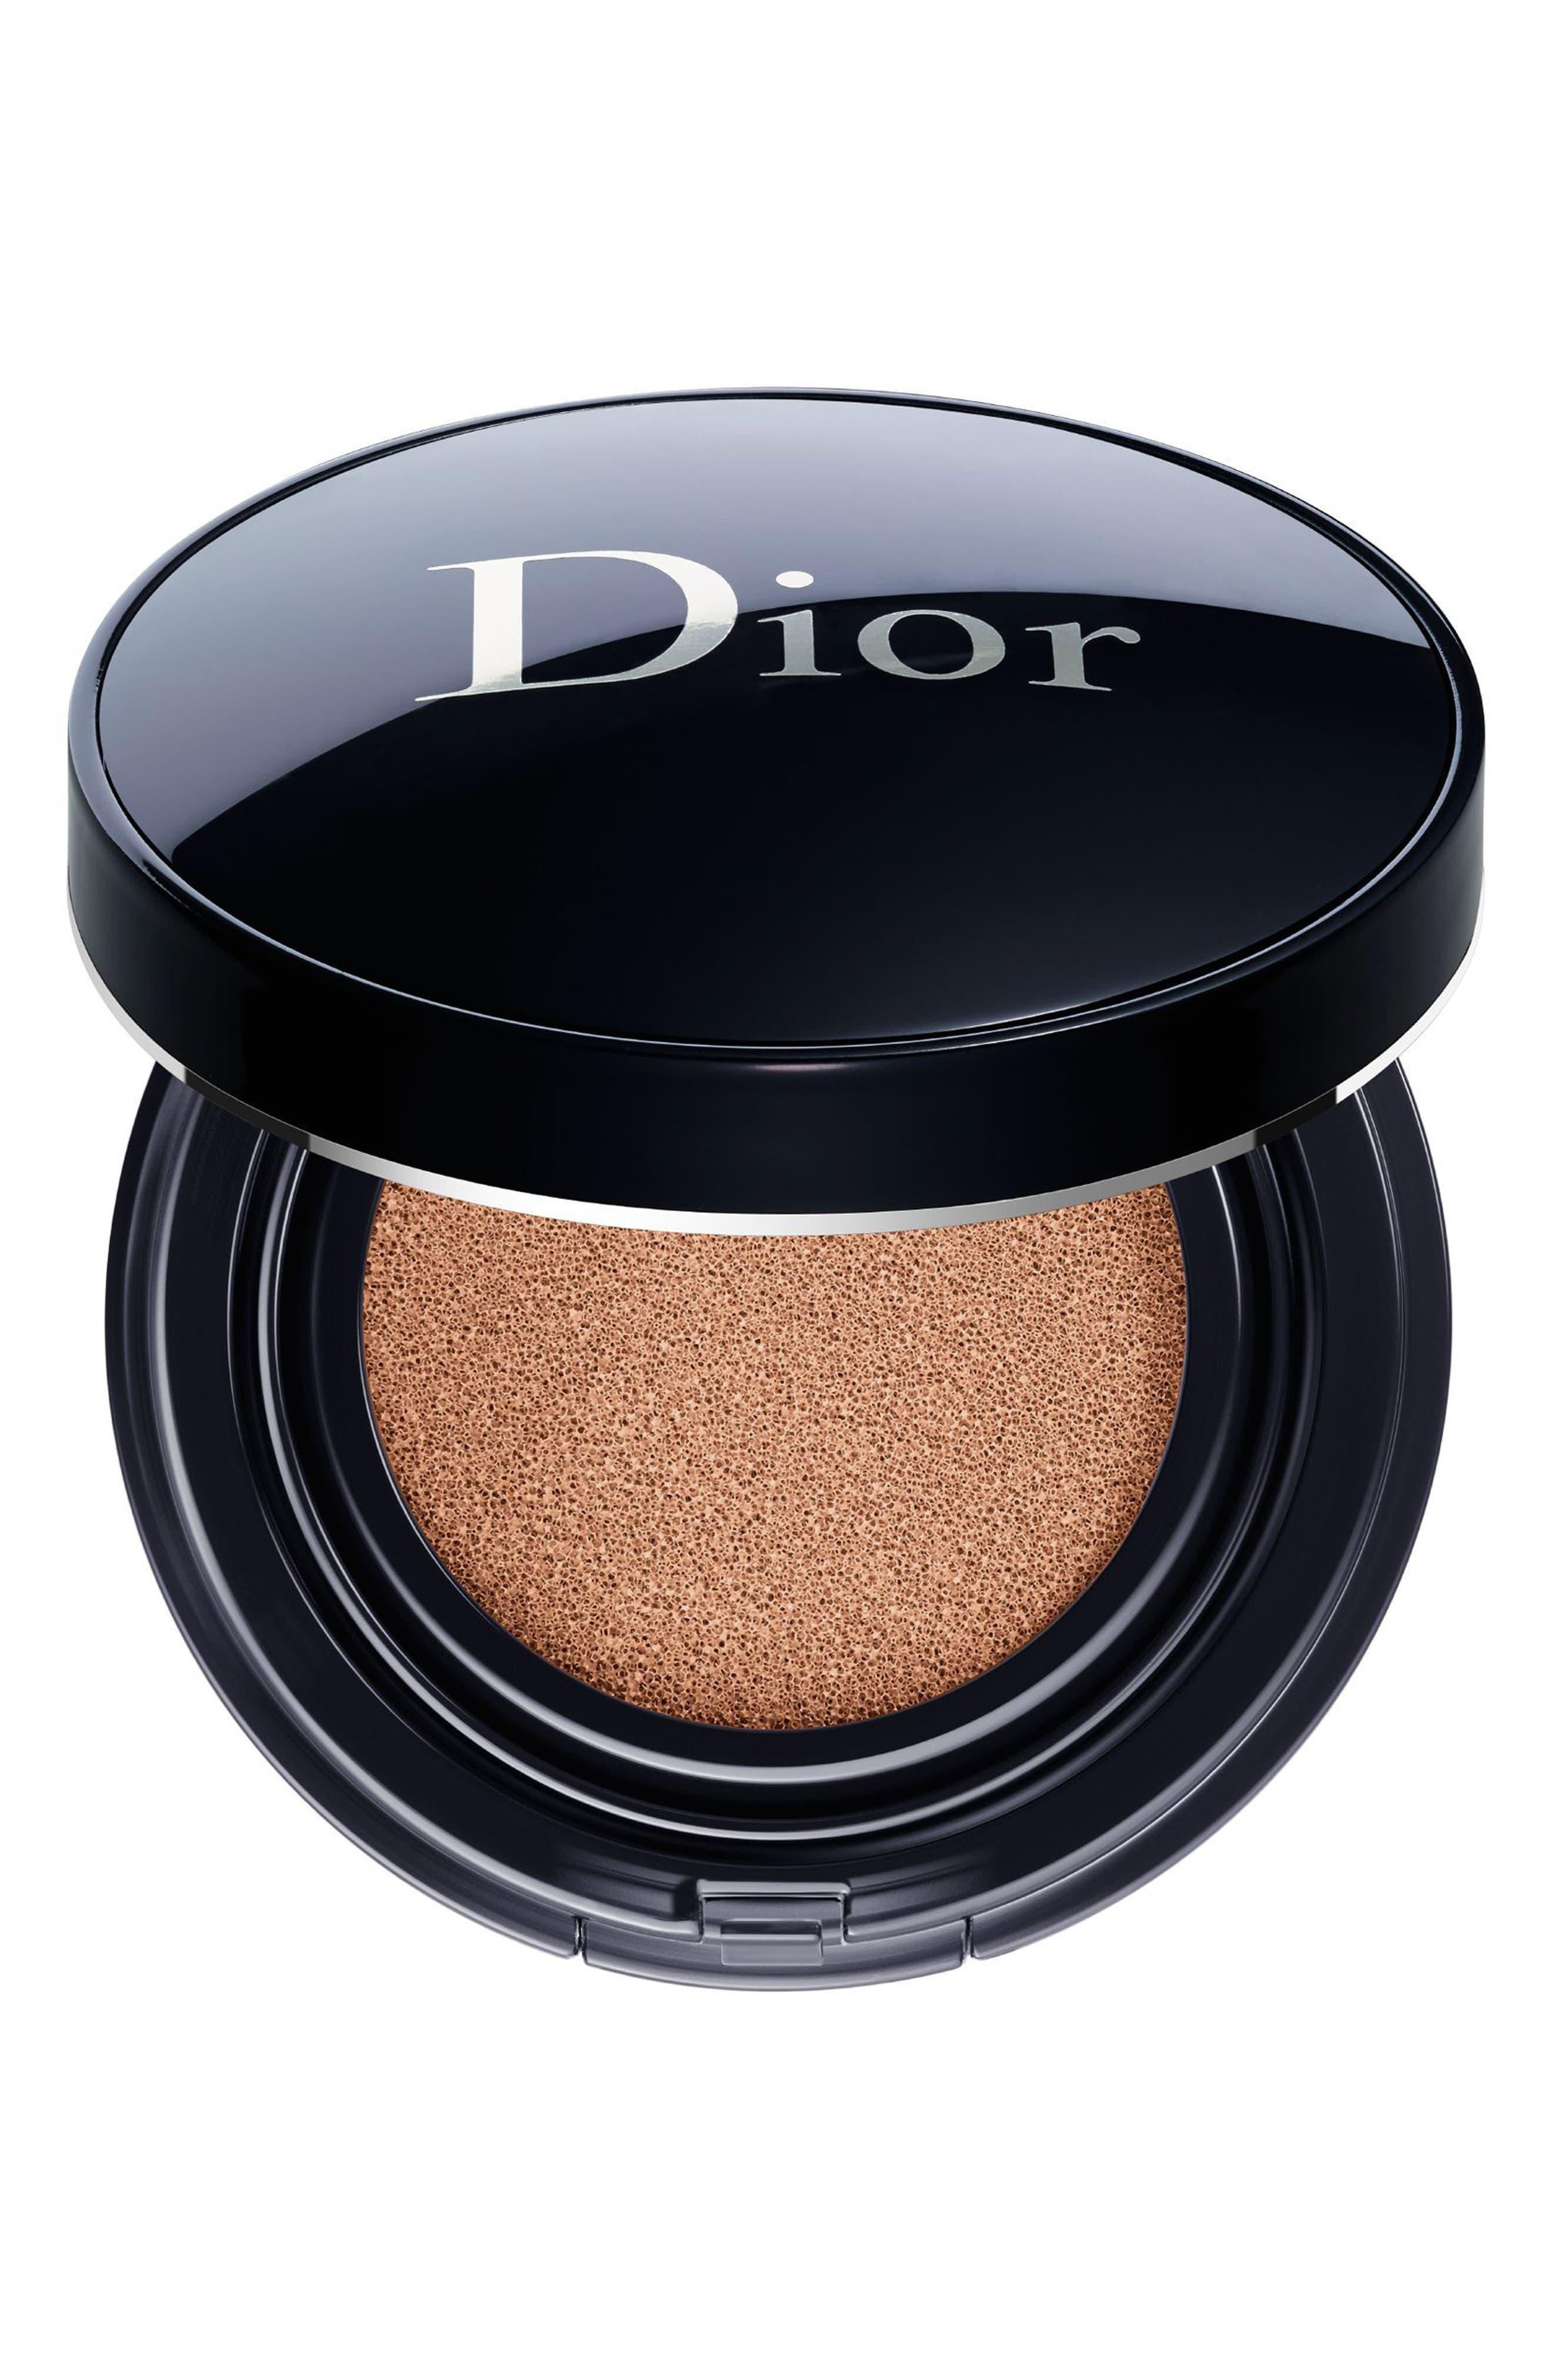 Dior Diorskin Forever Perfect Cushion Foundation Broad Spectrum Spf 35 - 040 Honey Beige